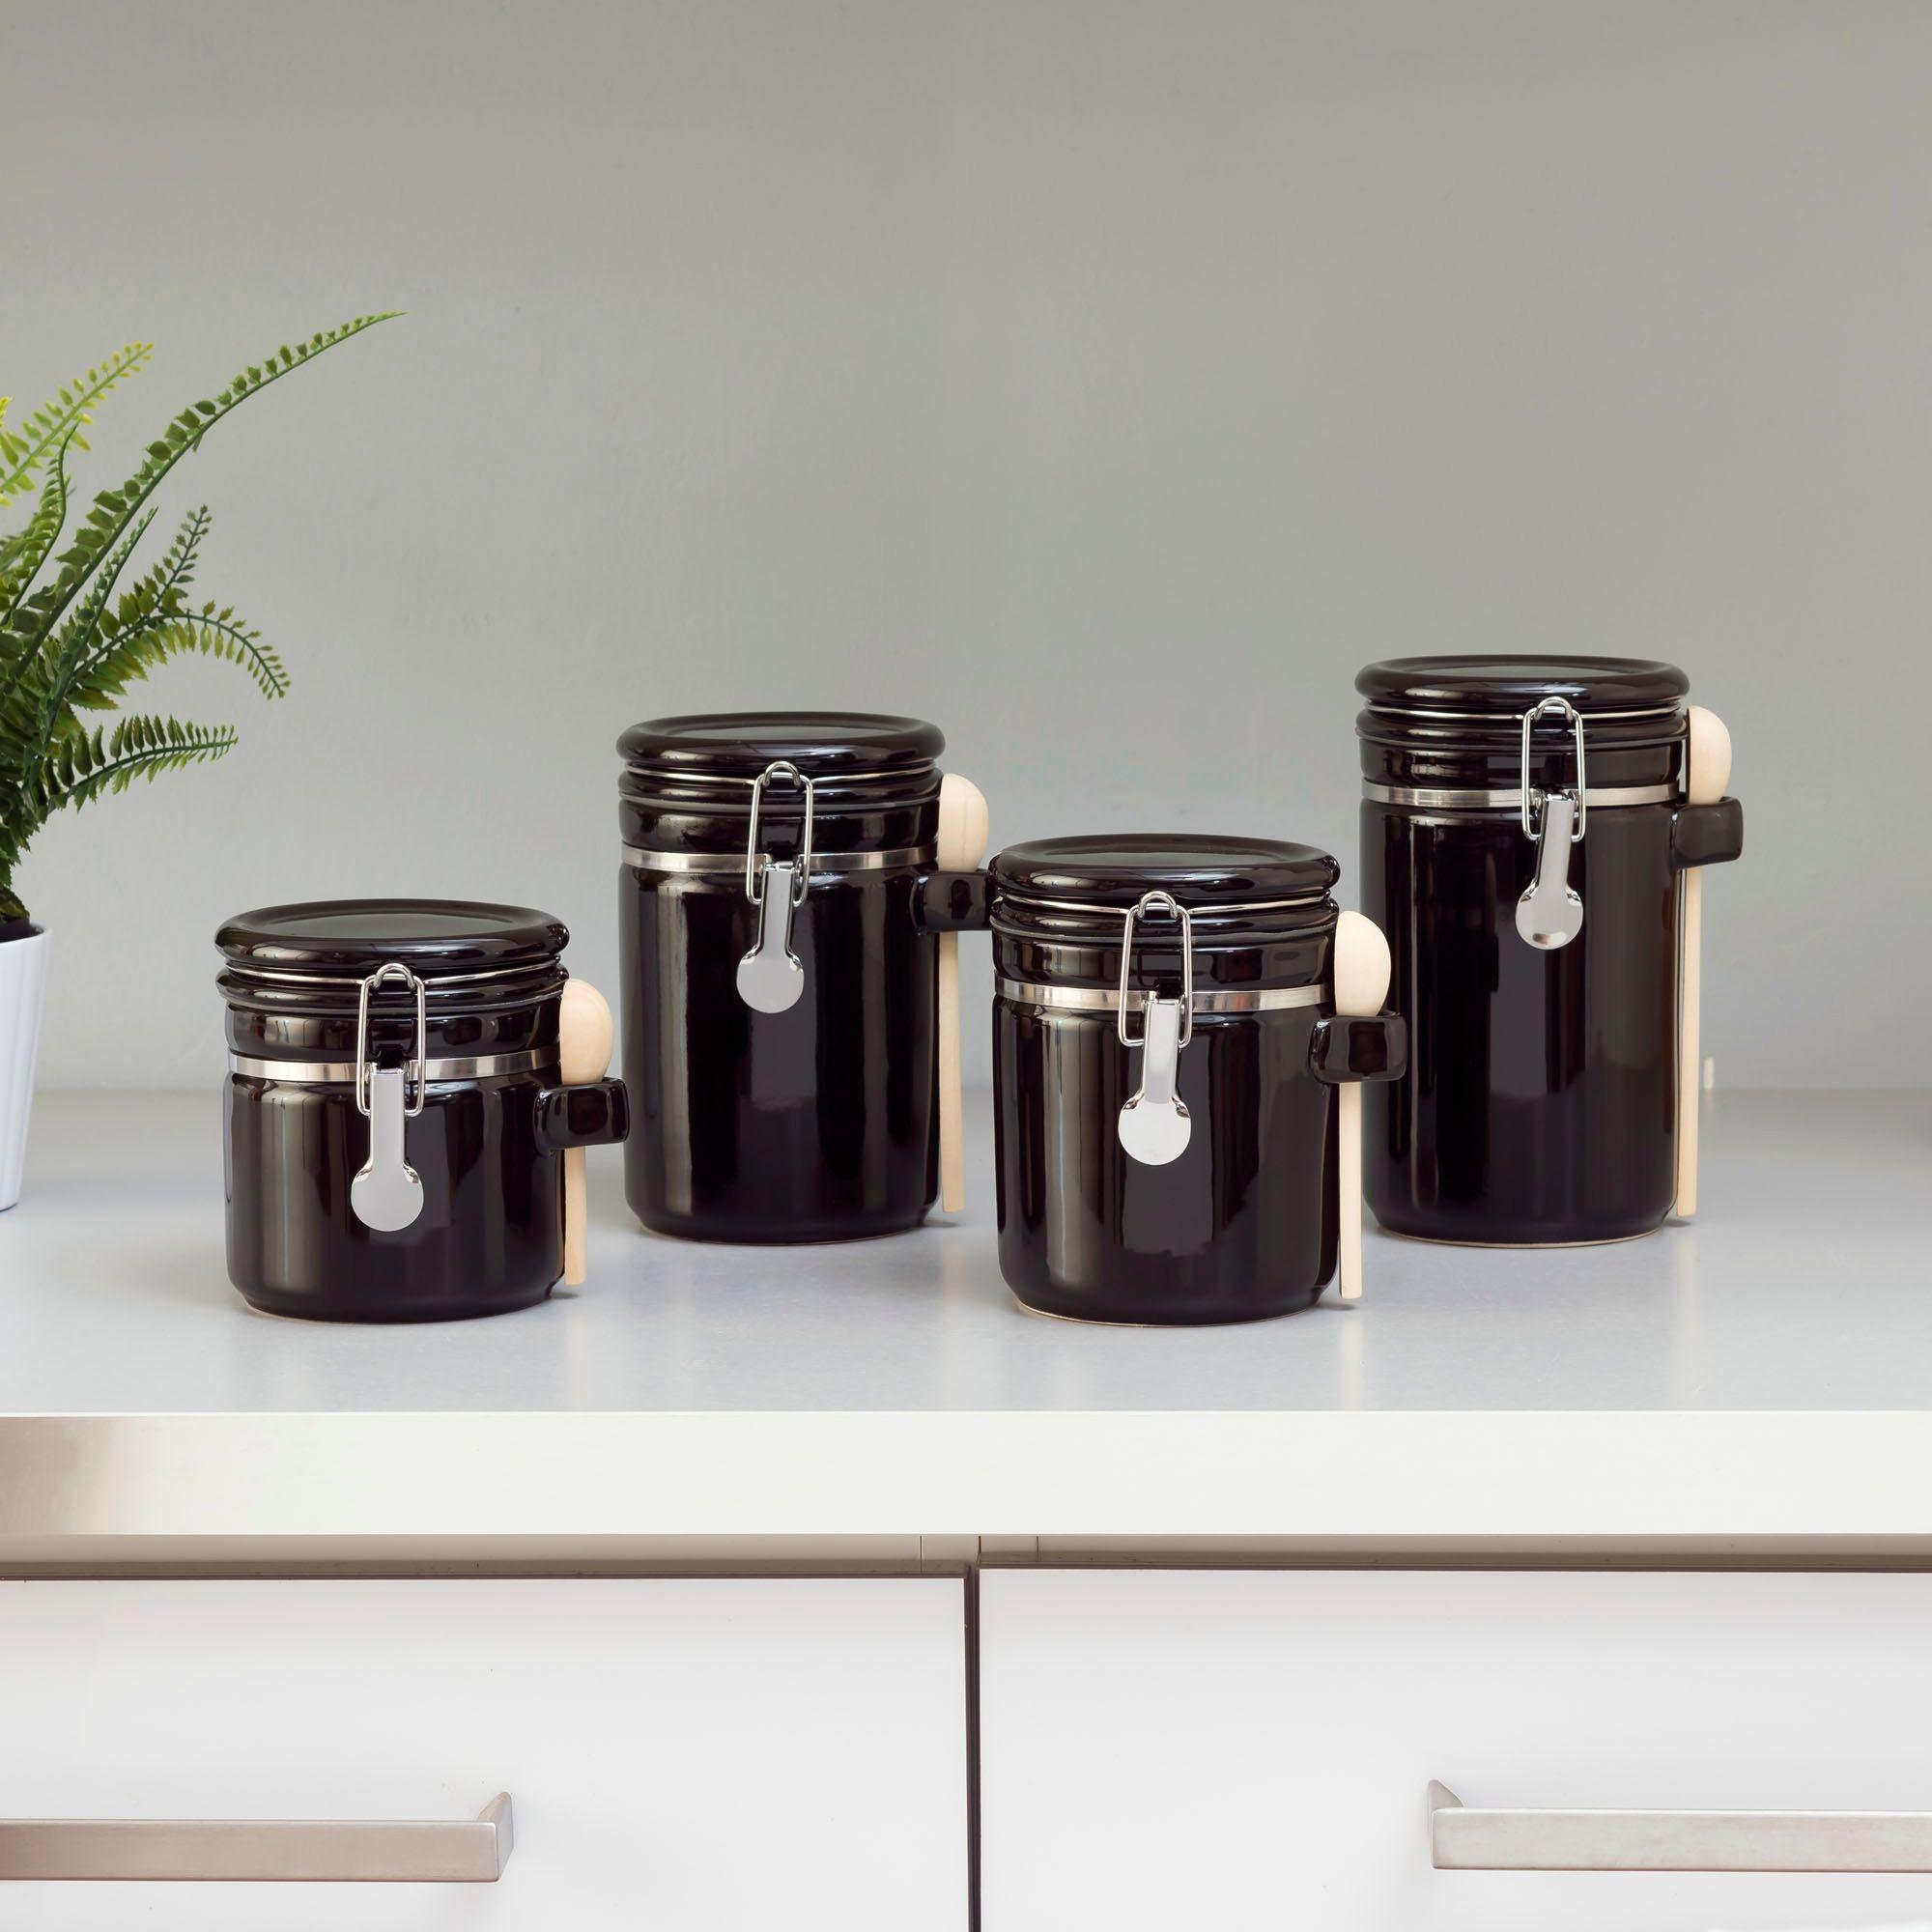 Black Ceramic Kitchen Canister Food Storage Jar Set Sugar Coffee Tea Flour Spoon Kitchen Canister Sets Ceramic Canister Set Kitchen Canisters